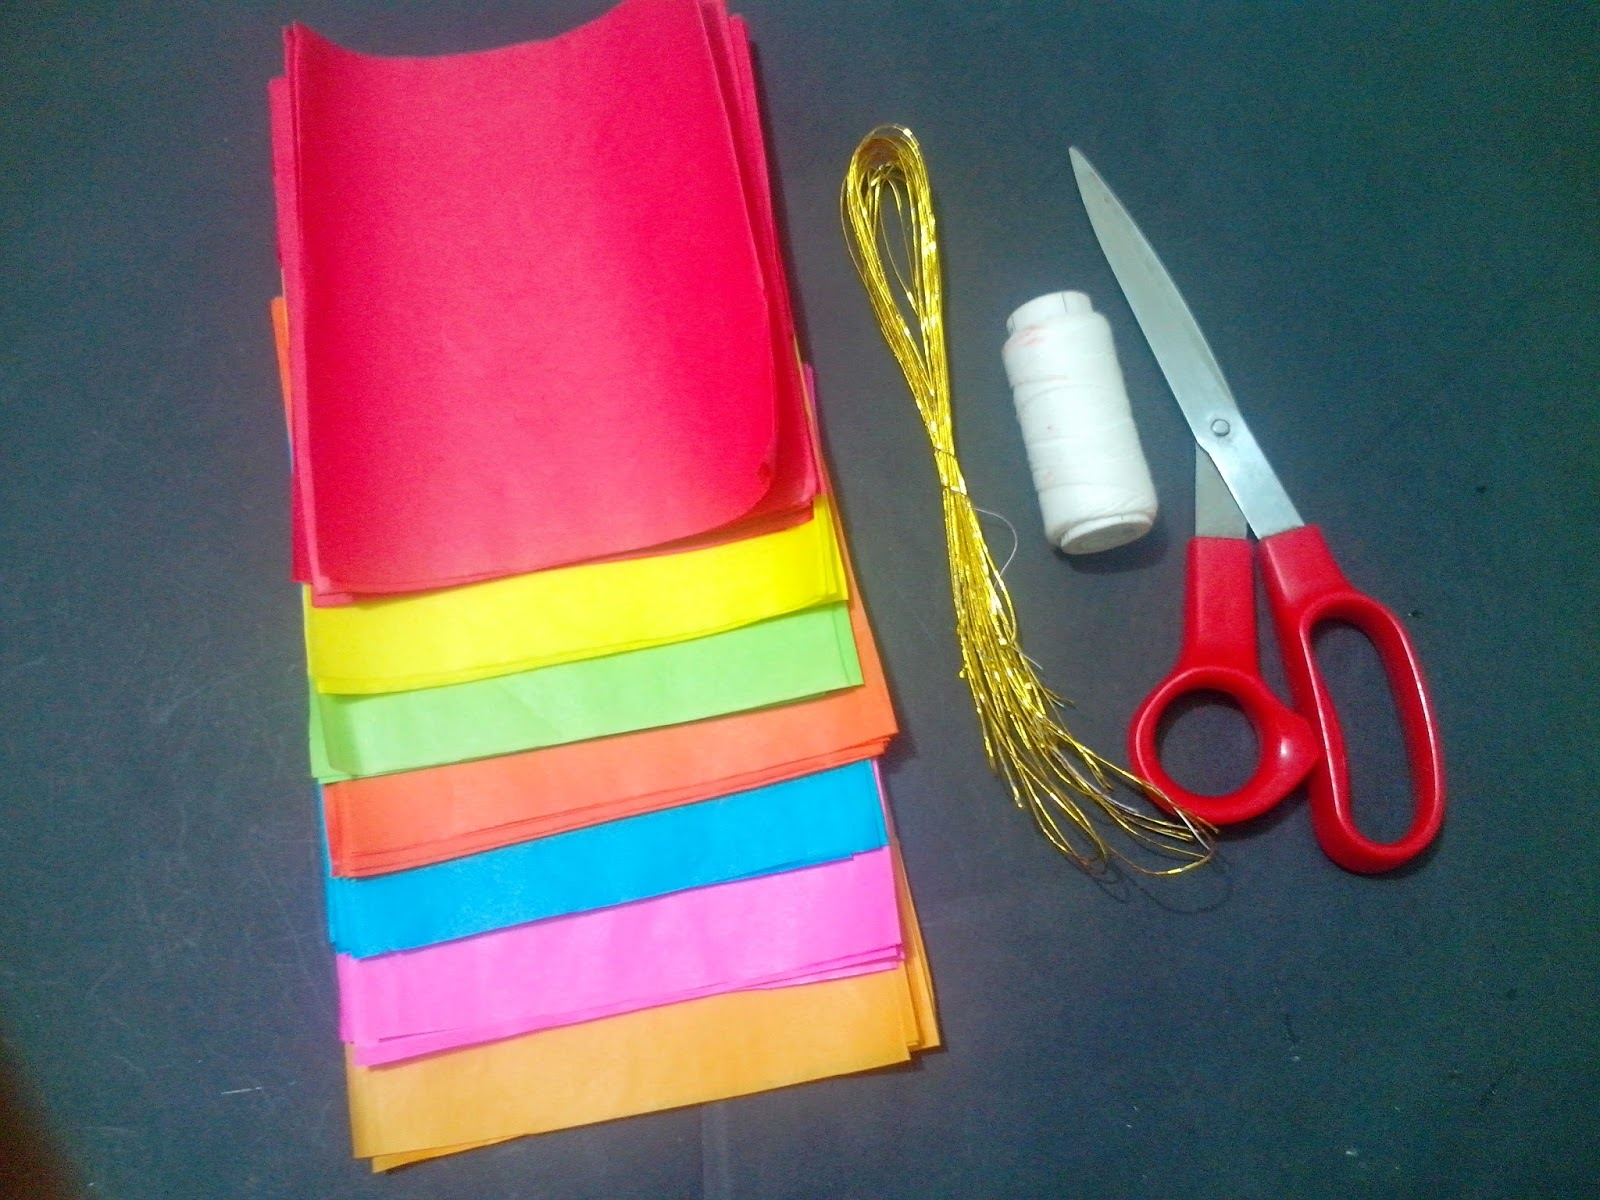 The crafty world pankh arts pom pom tissuekite paper flowers step 1 mightylinksfo